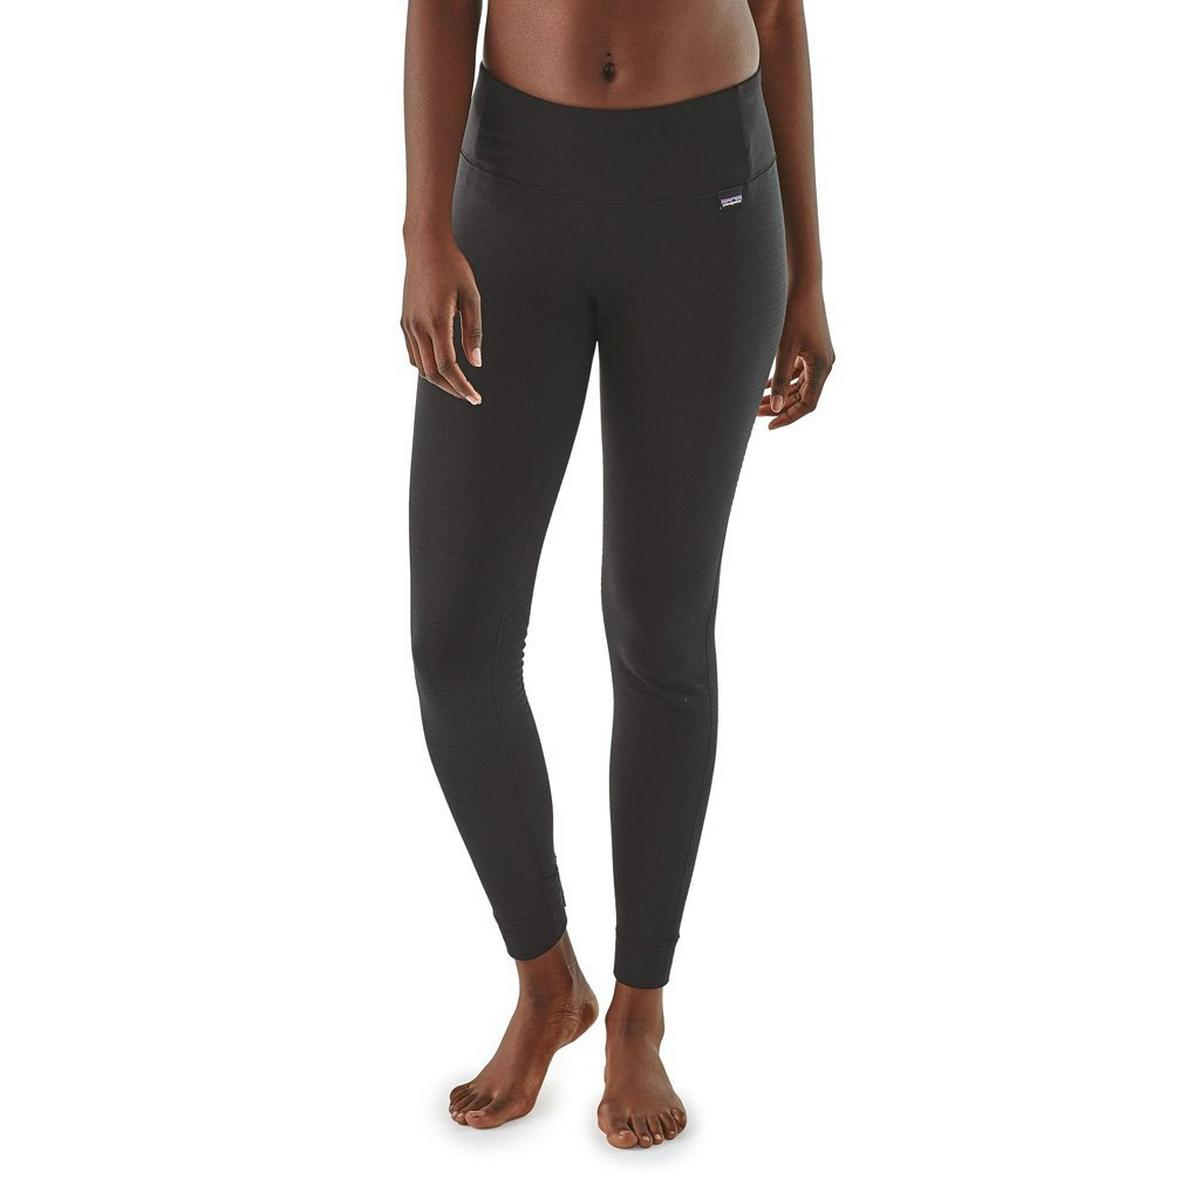 Patagonia BASE LAYER Pants Women's Capilene Thermal Weight Bottoms Black